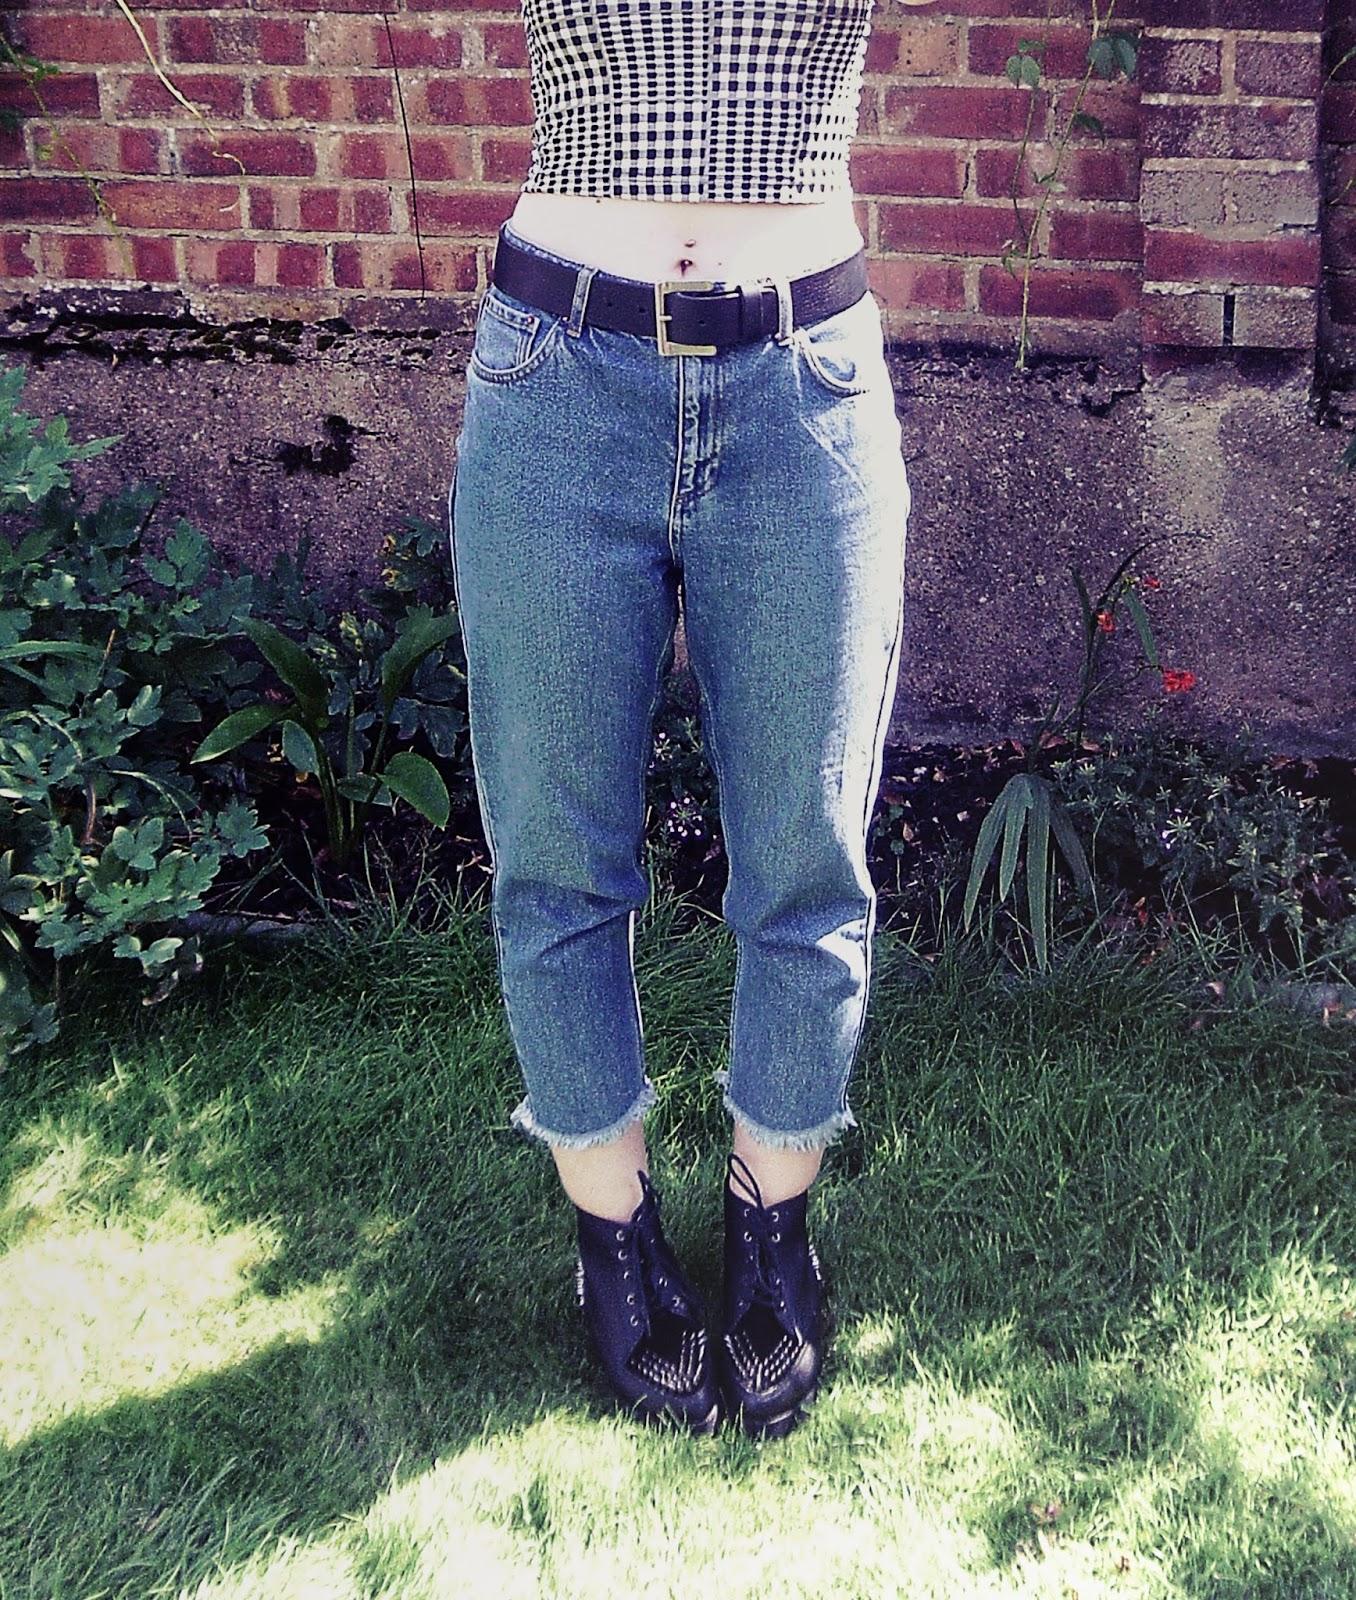 90's, 90's fashion, 90's style, 90's grunge, spaghetti top, mom jeans, platform shoes, platform boots, flatform shoes, flatform boots, plaid shirt, oversized shirt, oversized plaid shirt